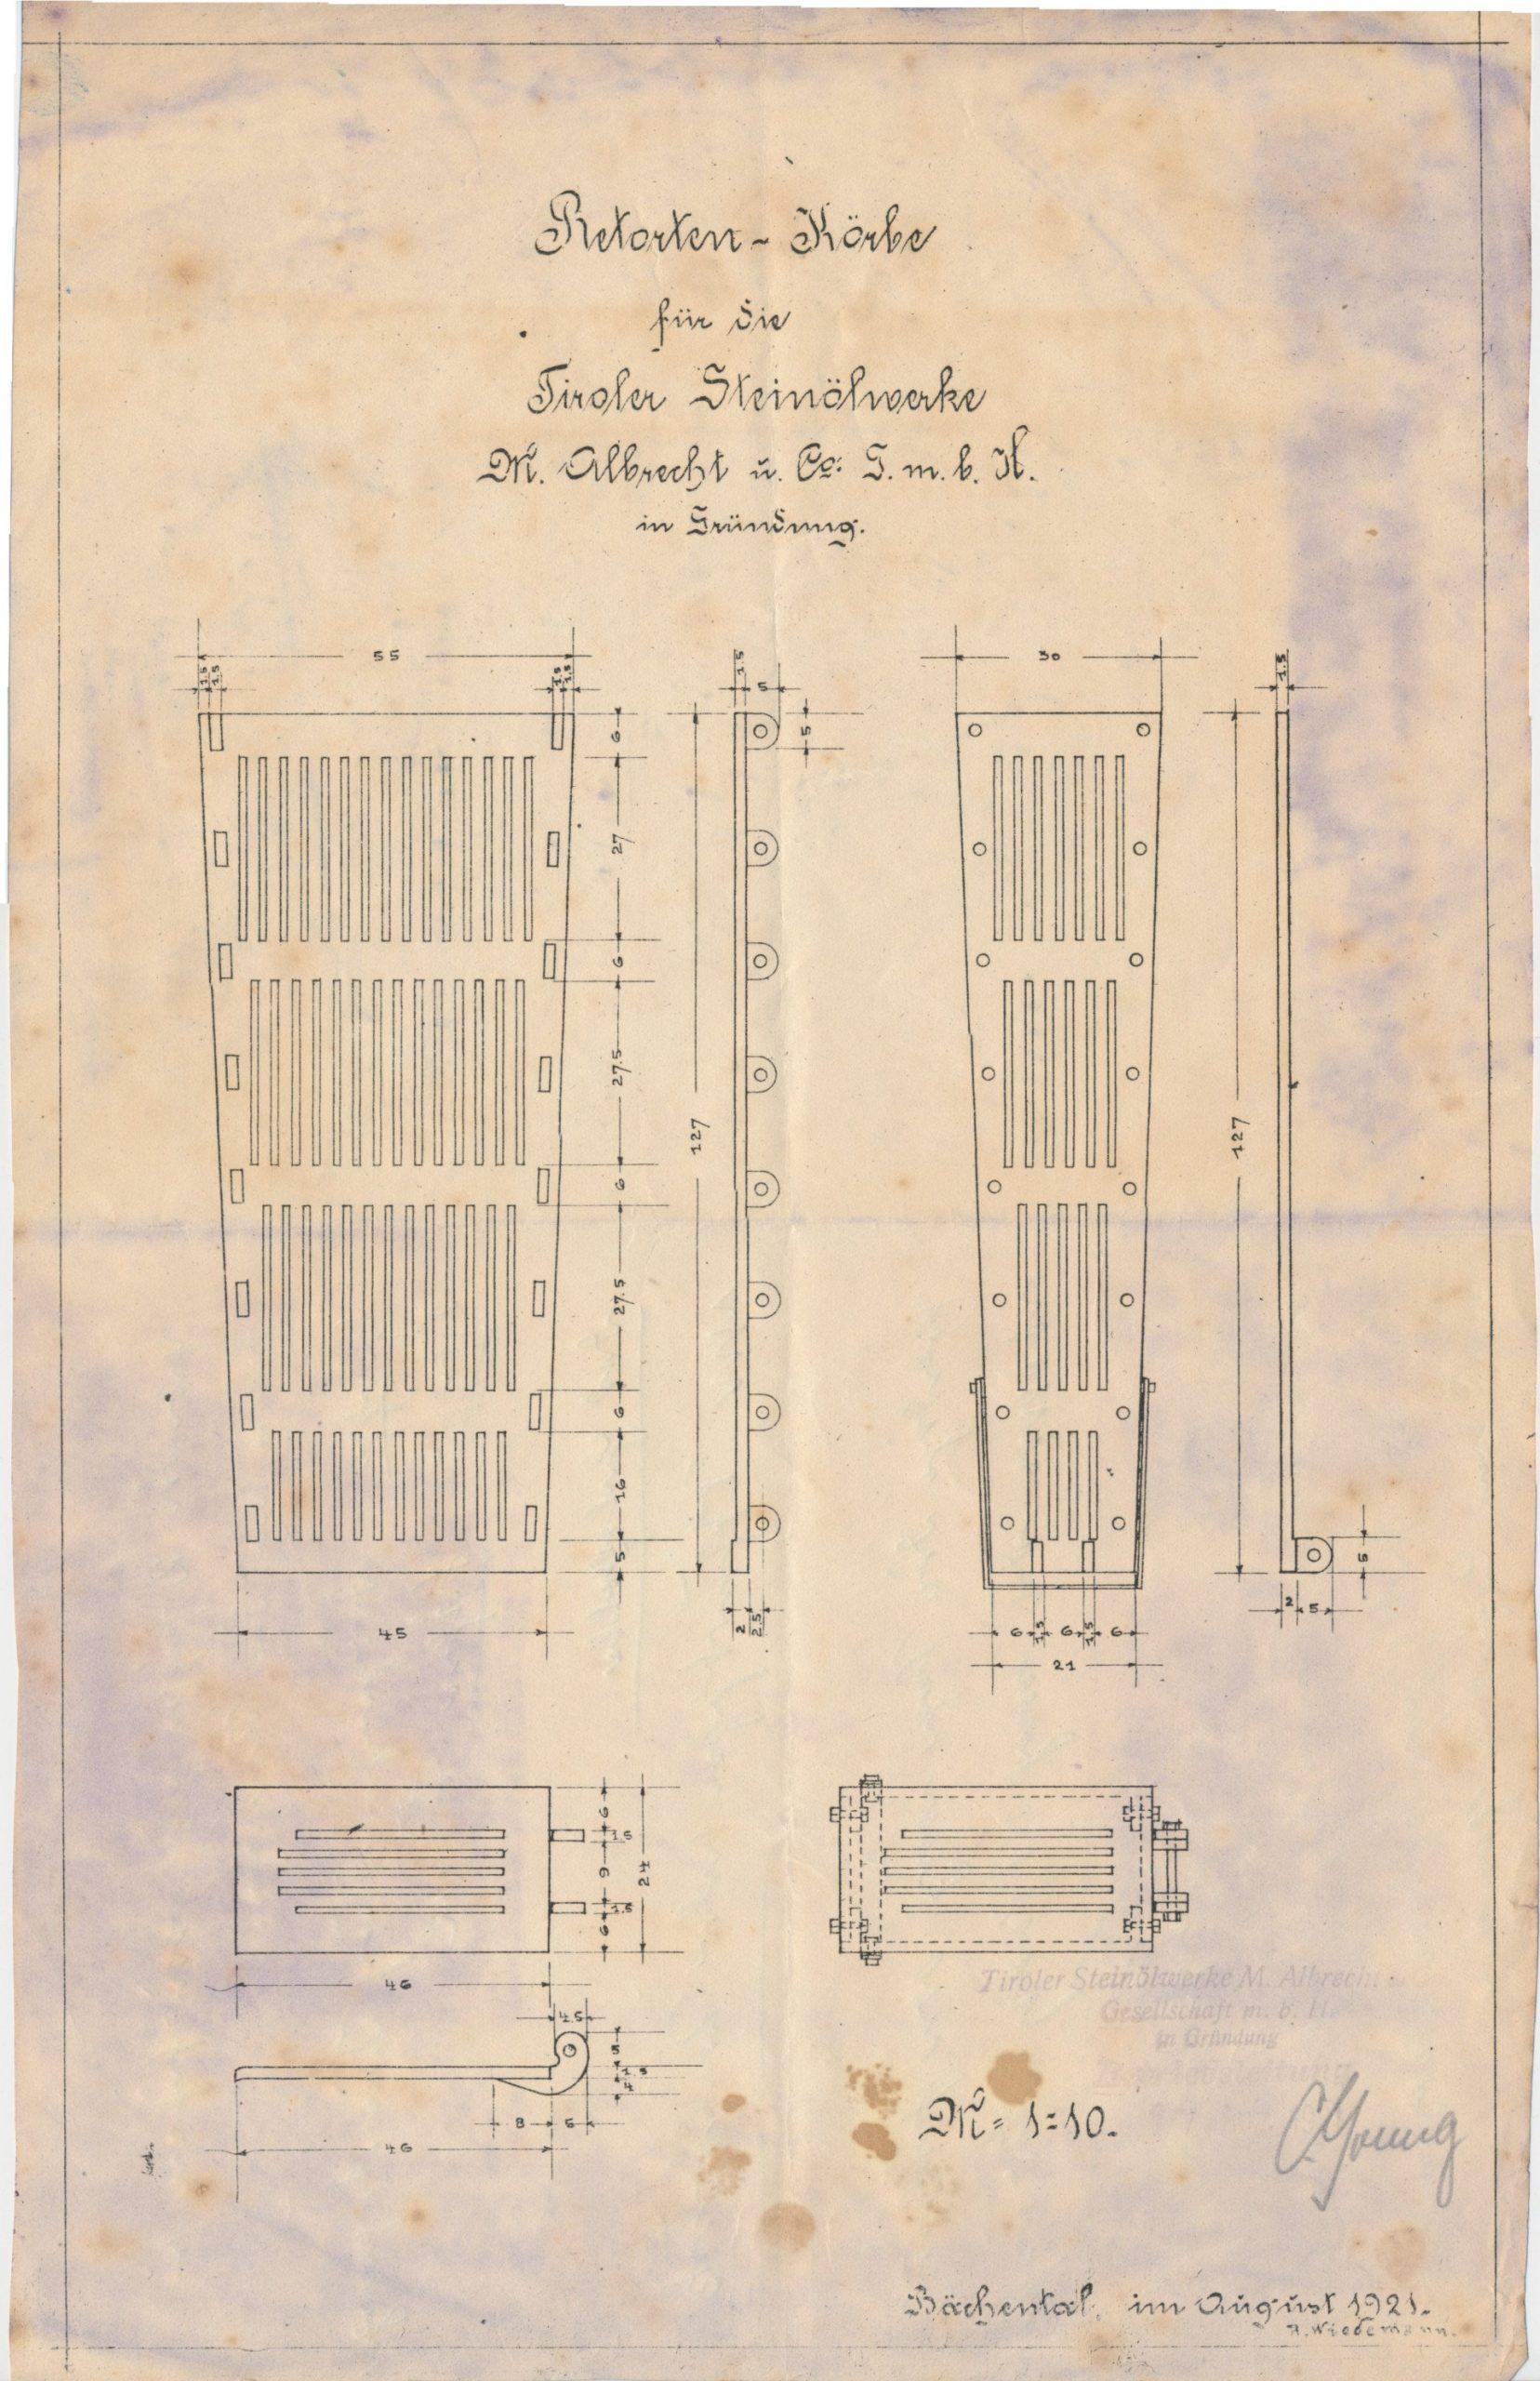 Plan Retortenkörbe 1921 scaled